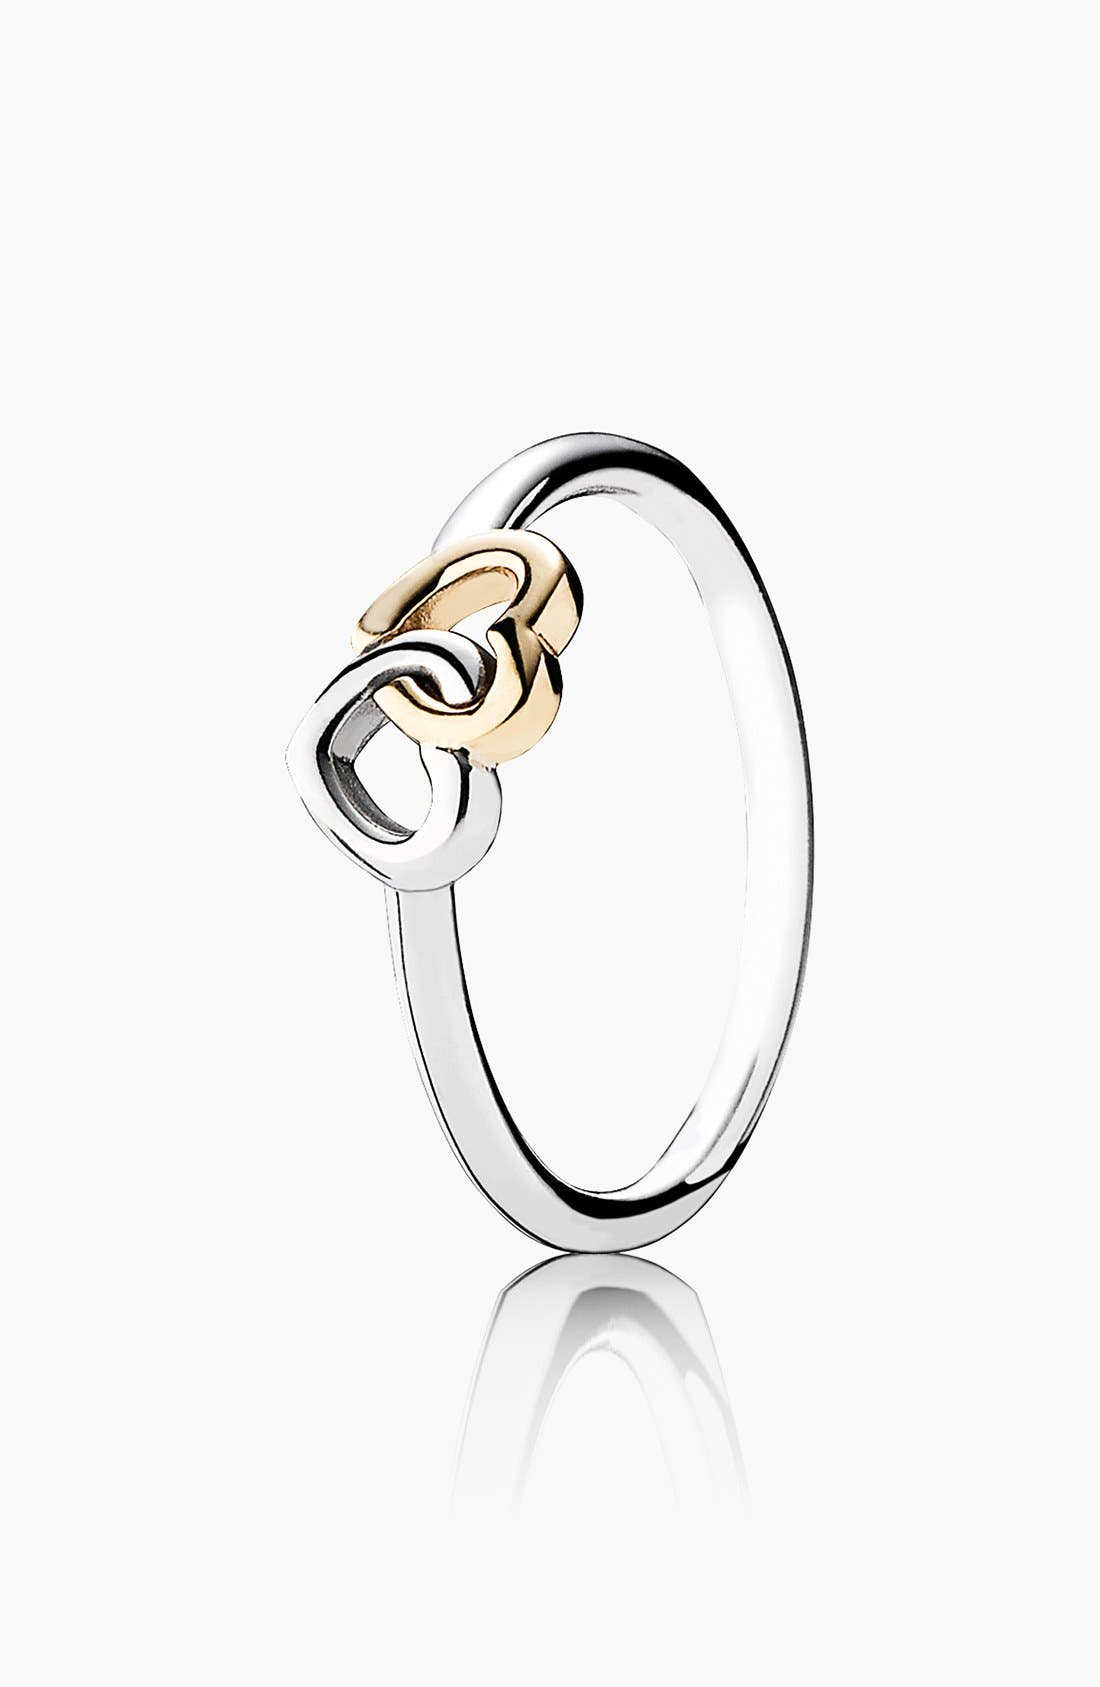 Alternate Image 1 Selected - PANDORA 'Heart to Heart' Ring